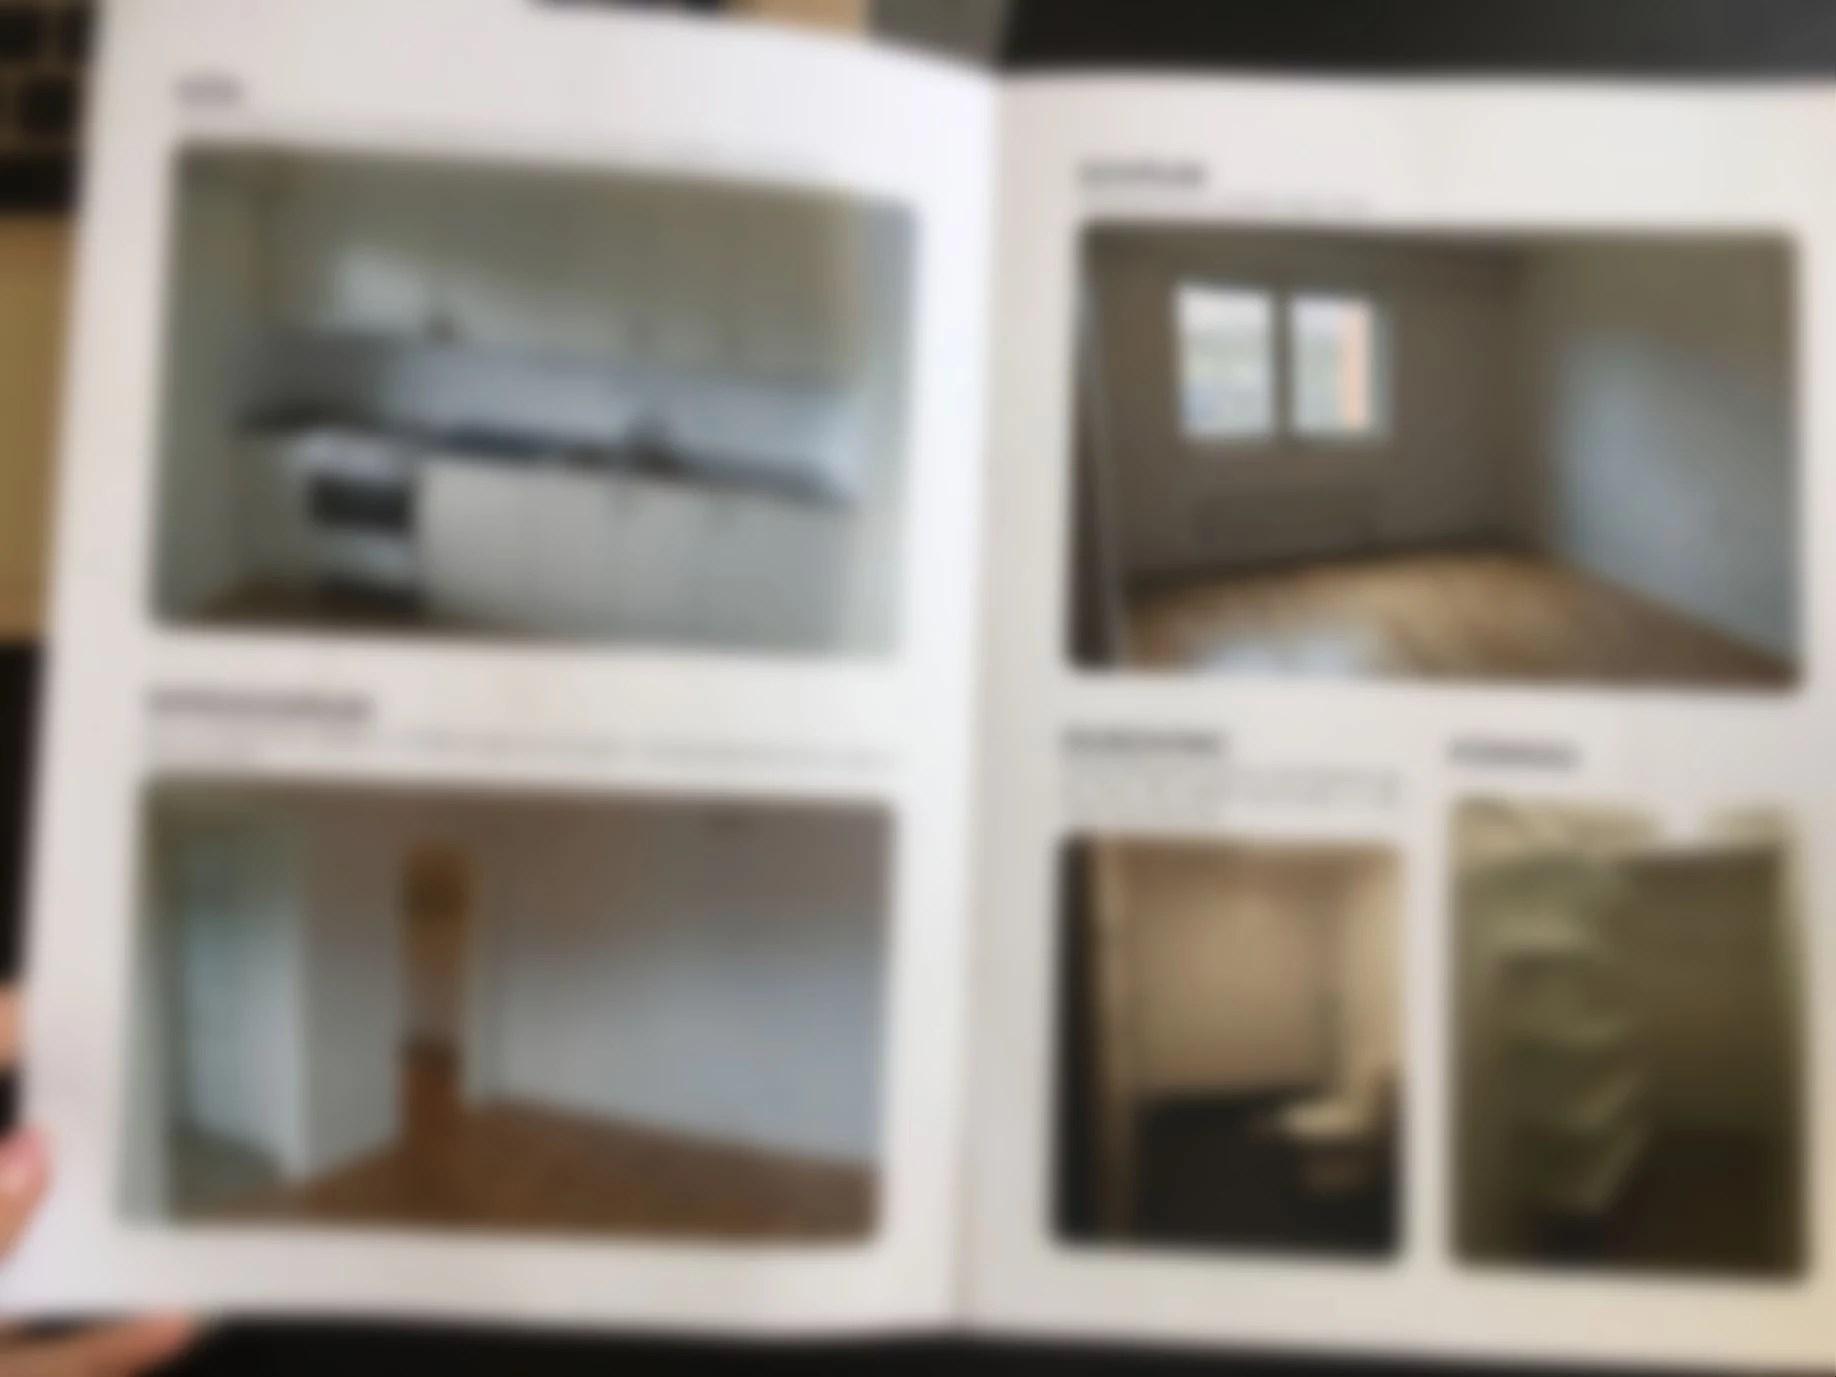 Hur ser lägenheten ut?